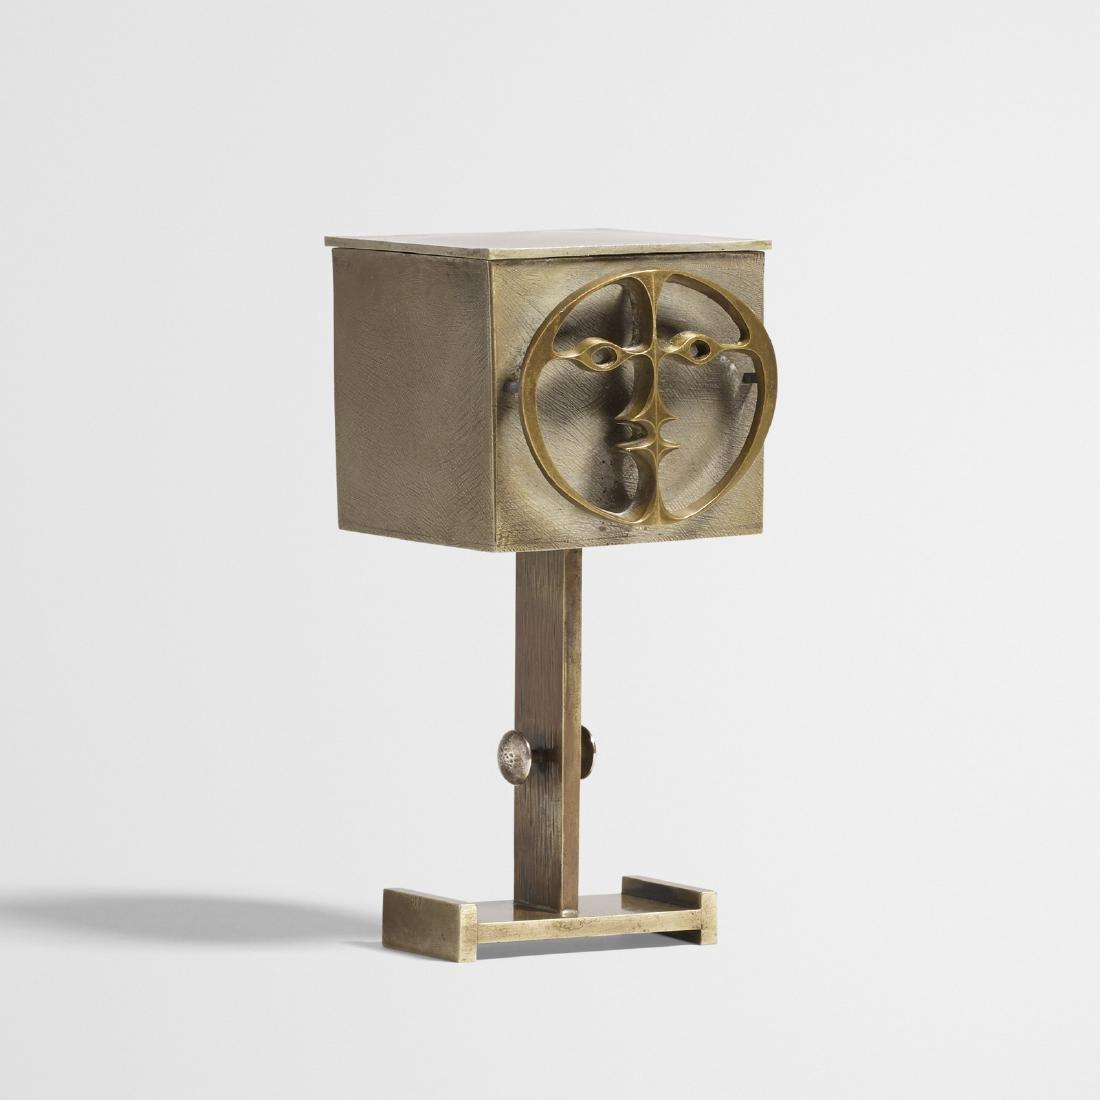 John Prip, standing lidded box